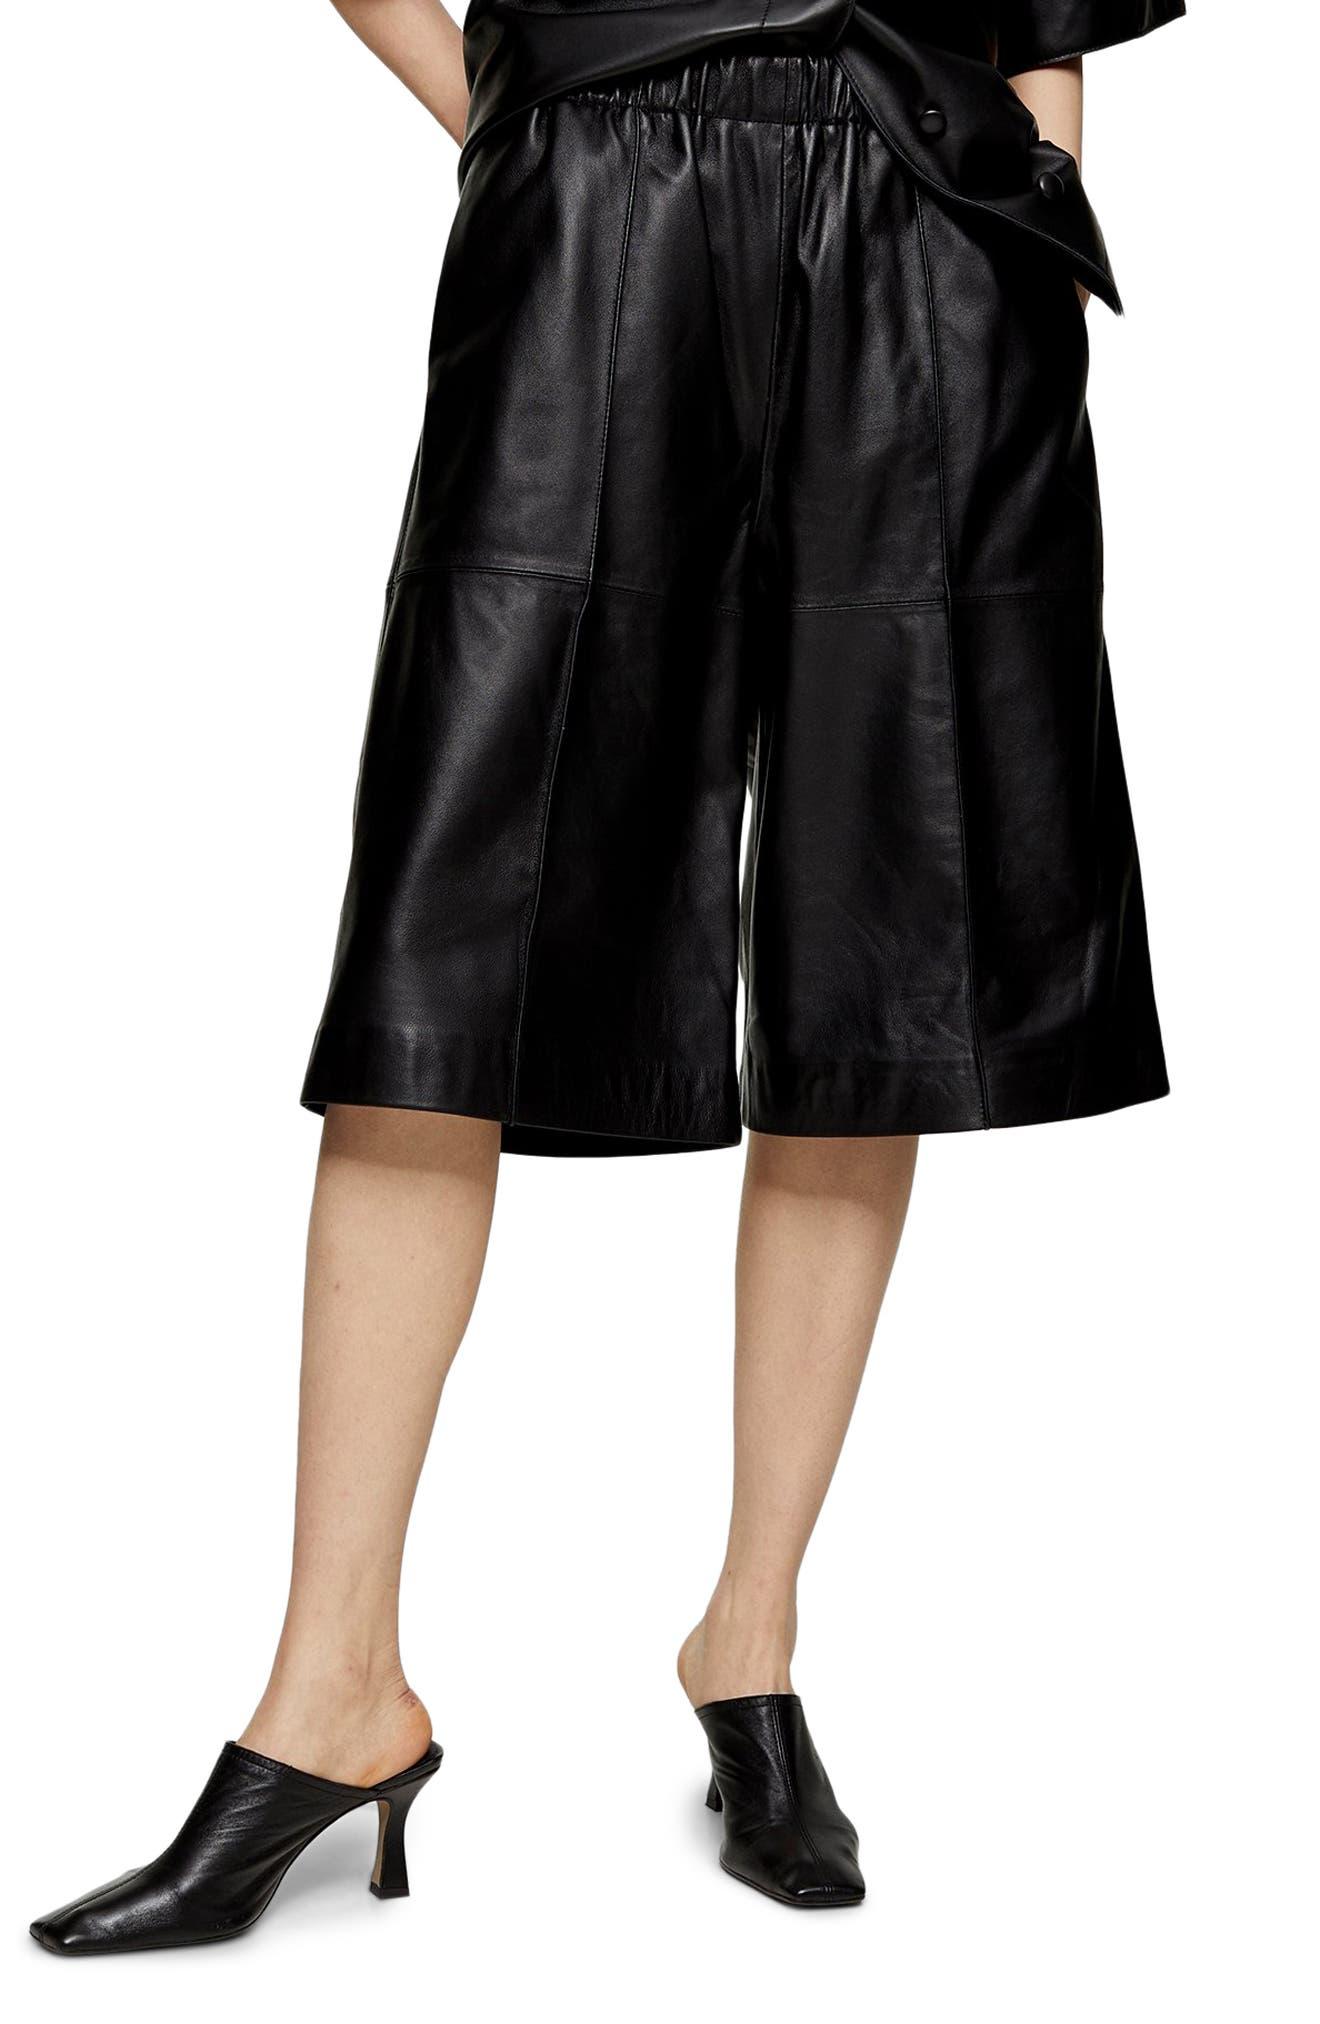 Women's Topshop Boutique Leather Bermuda Shorts,  2 US (fits like 0) - Black